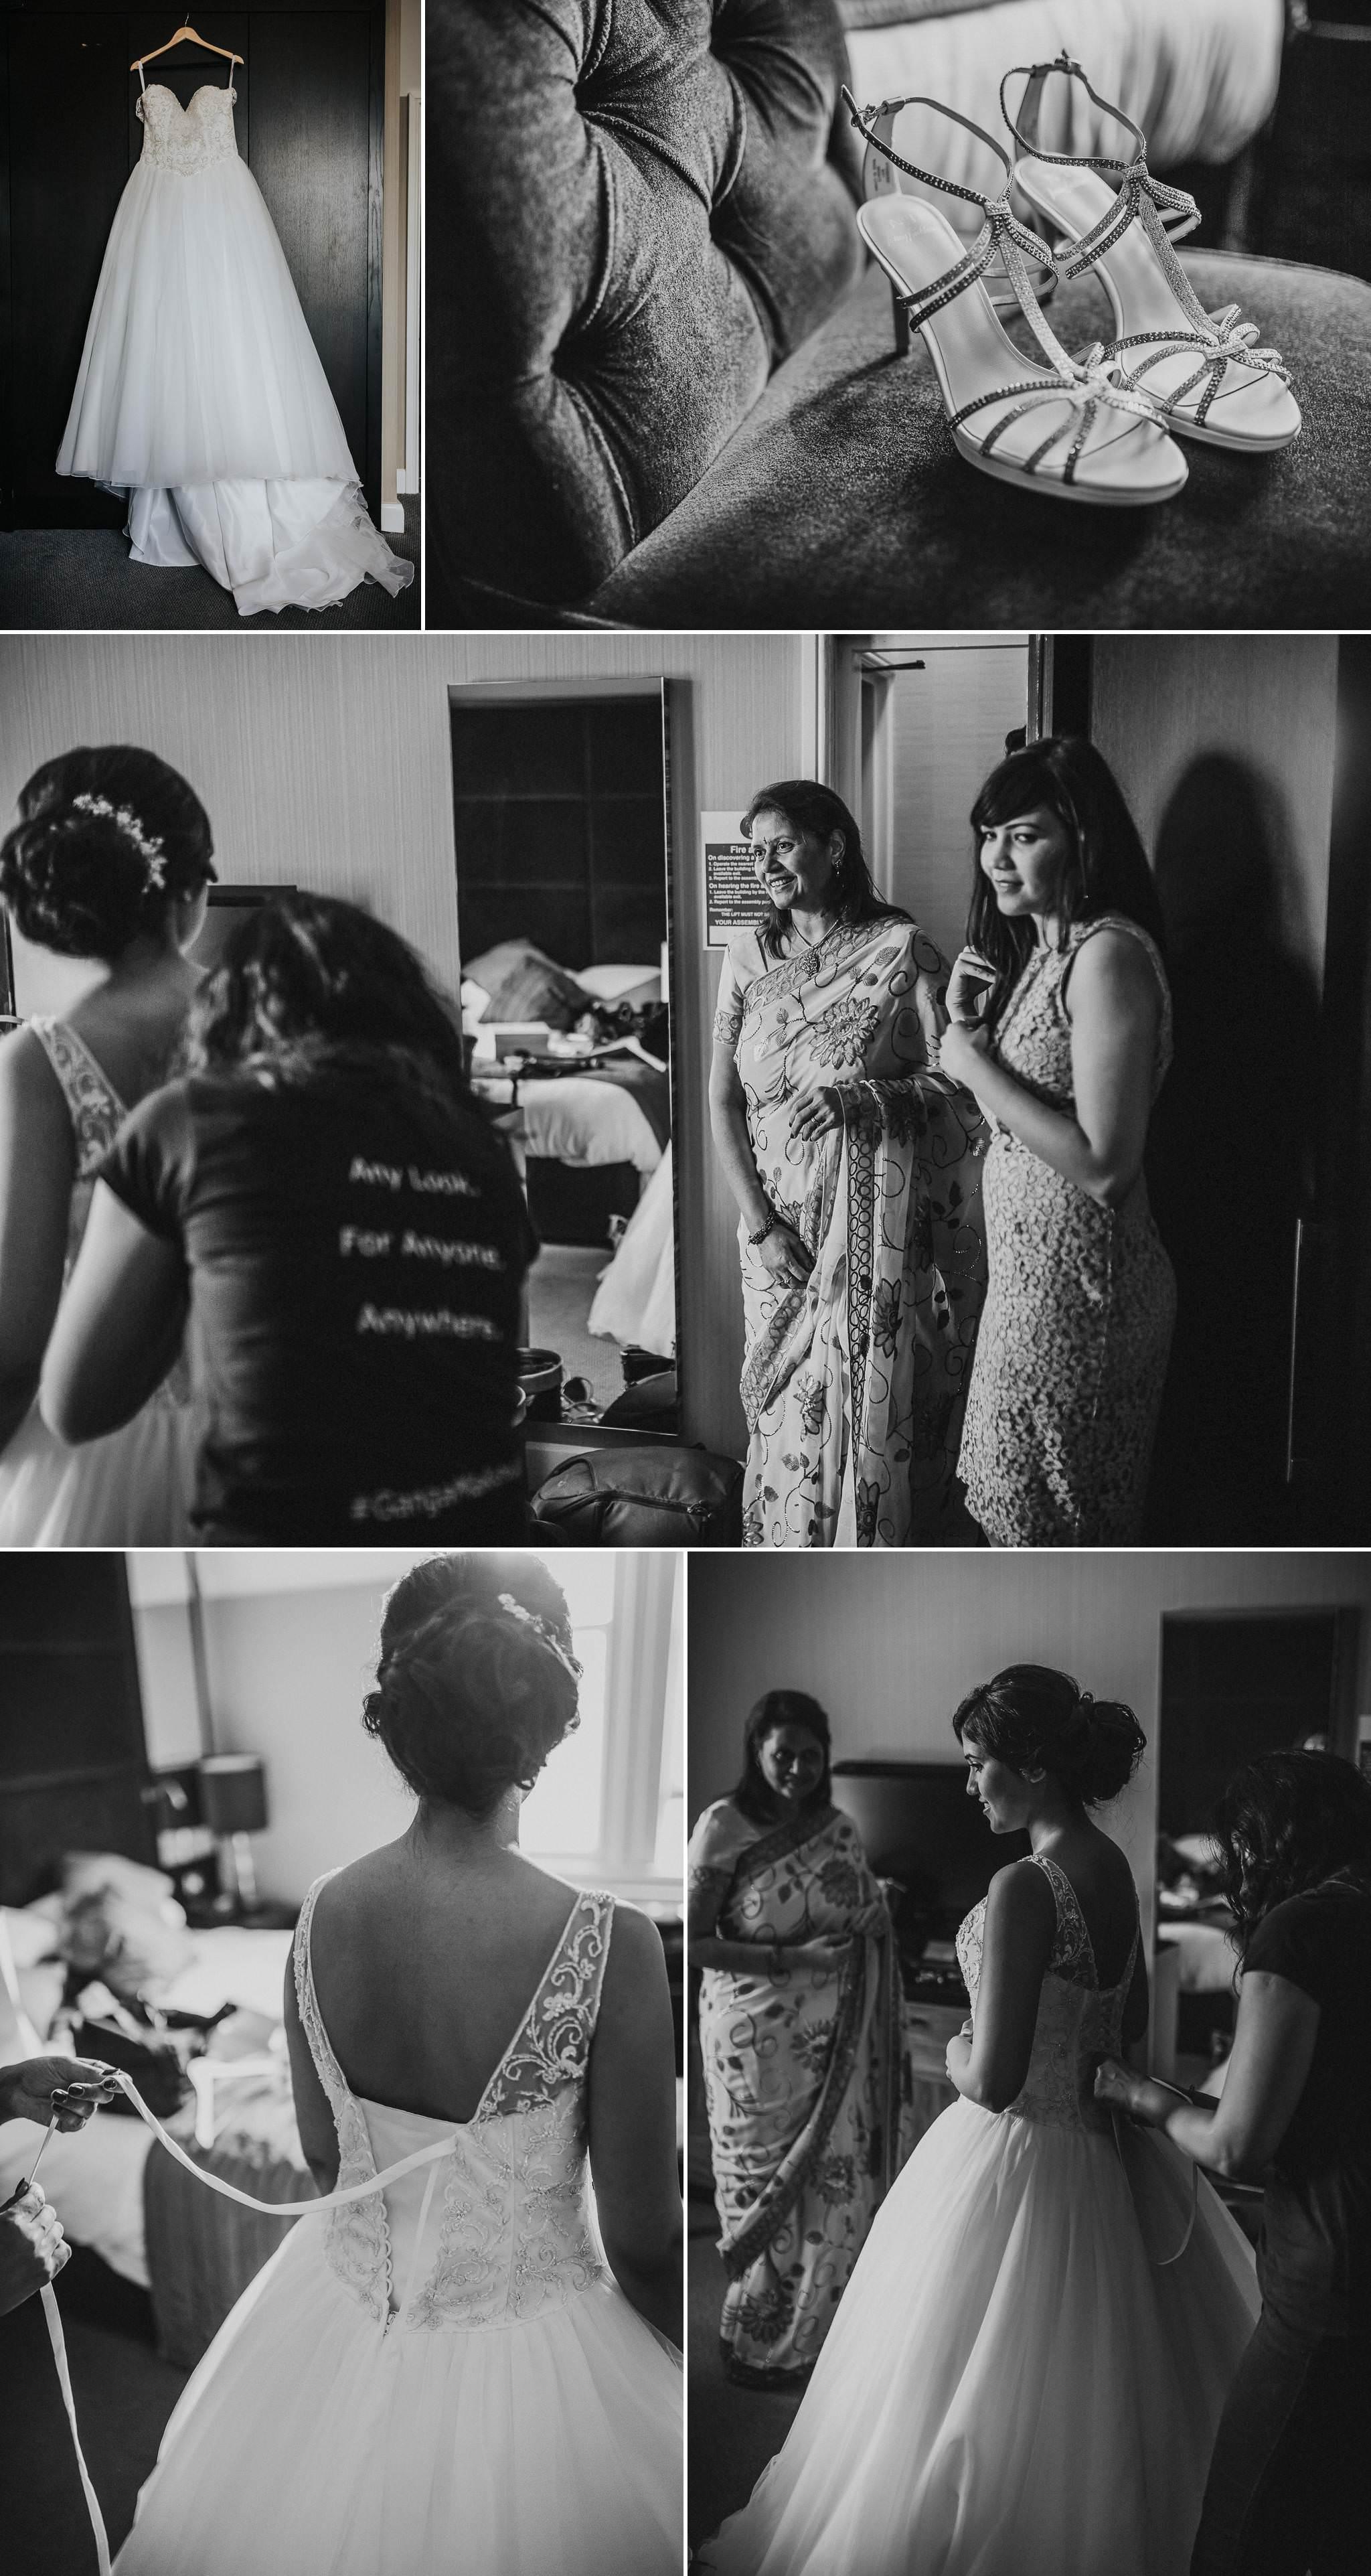 compton-verney-wedding-photos 5.jpg